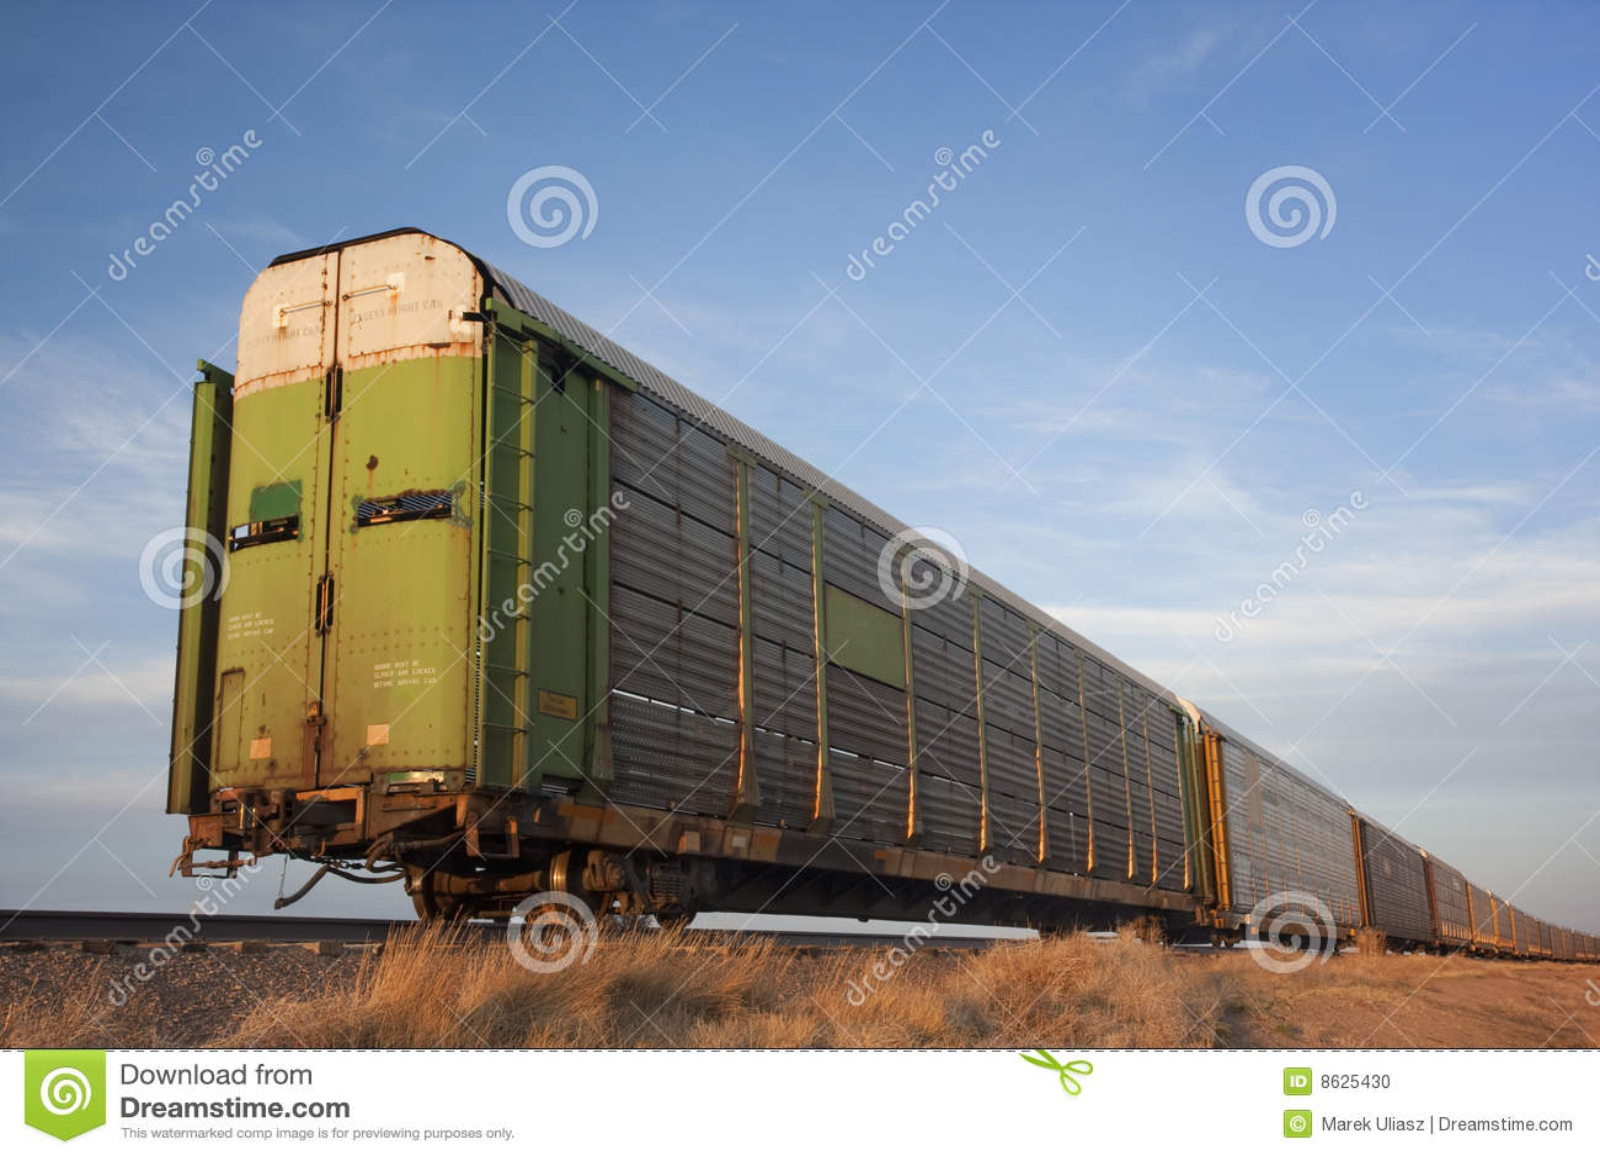 Train Of Rail Cars For Livestock Transportation Stock Photo Image 8625430